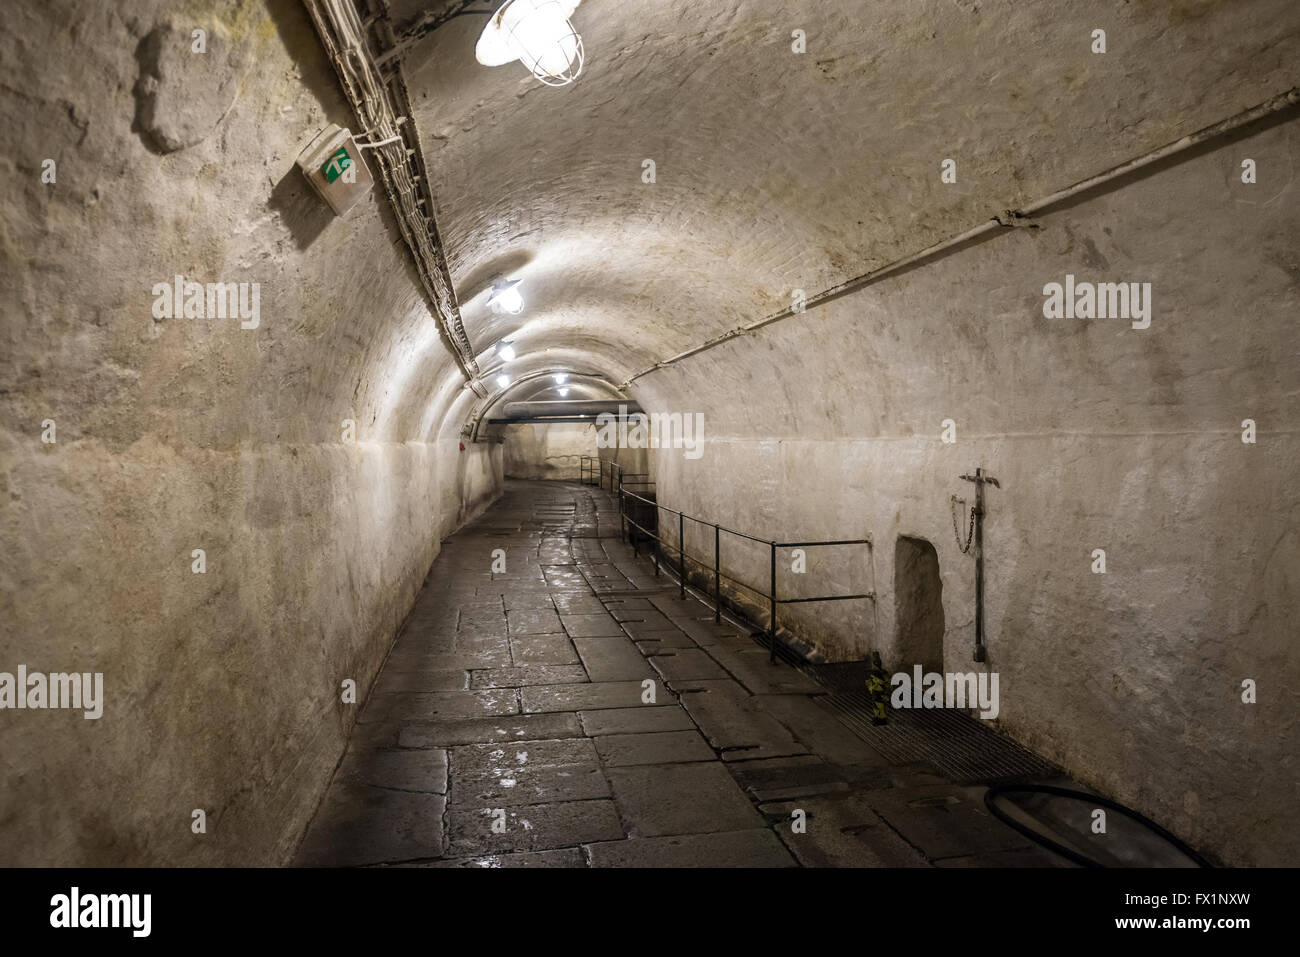 c7a994cfcbb806 Underground corridor in Pilsner Urquell Brewery in Pilsen city ...